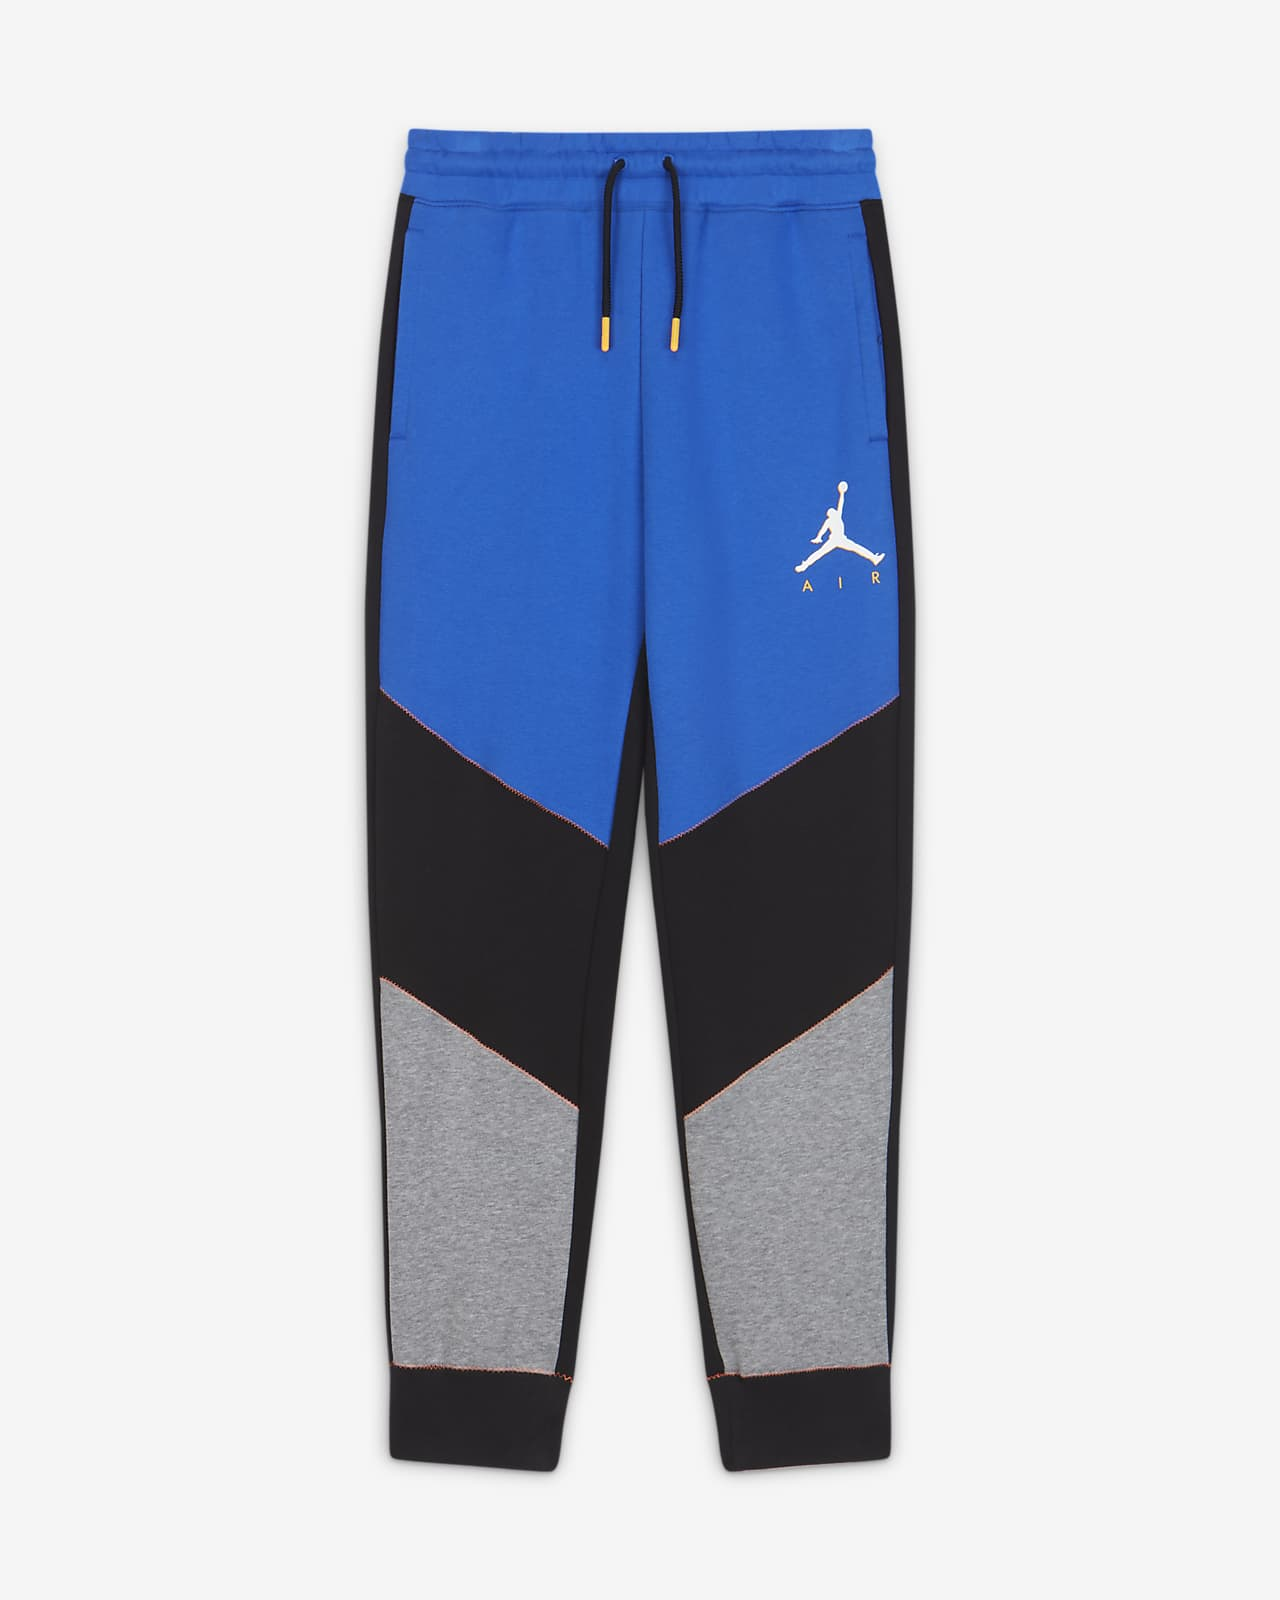 Jordan Older Kids' (Boys') Colour-Block Trousers